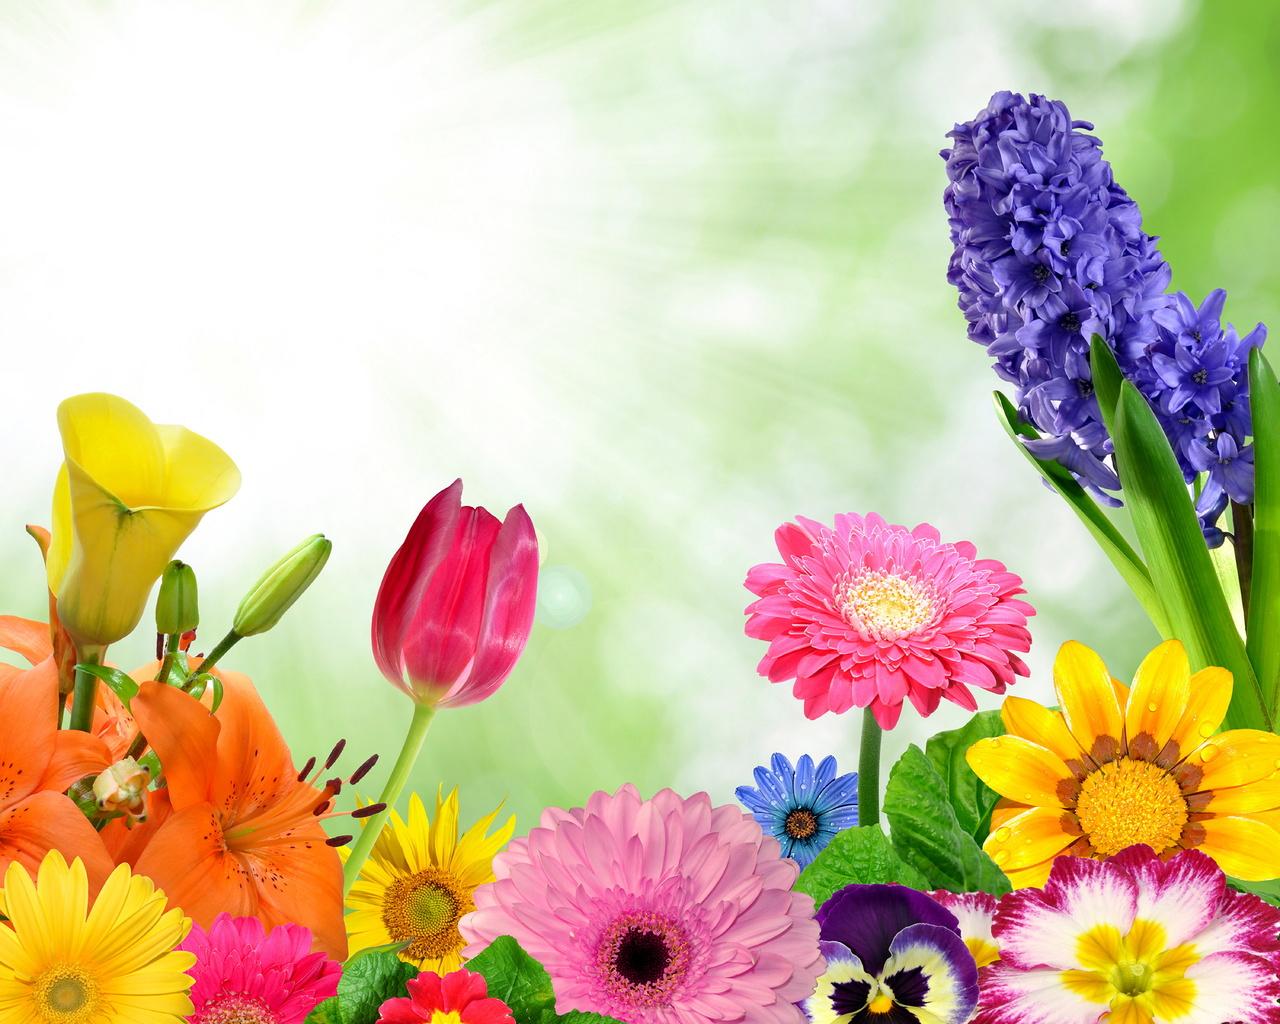 spring, flowers, colorful, gerbera, butterflies, bright, цветы, бабочки, весна